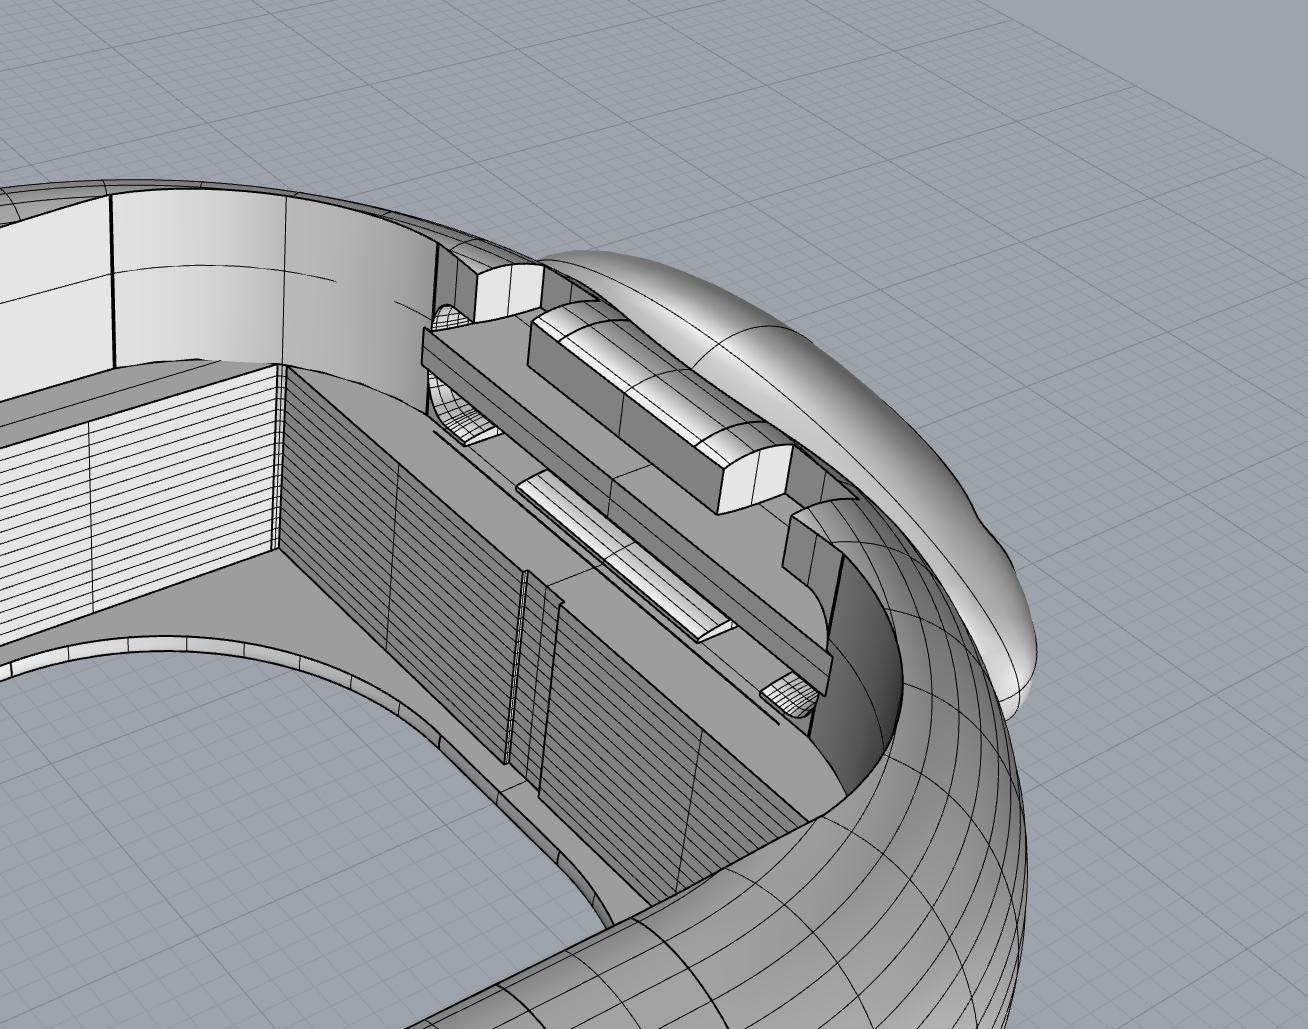 3d_printing_Screenshot_1_11_13_2_43_PM.jpg